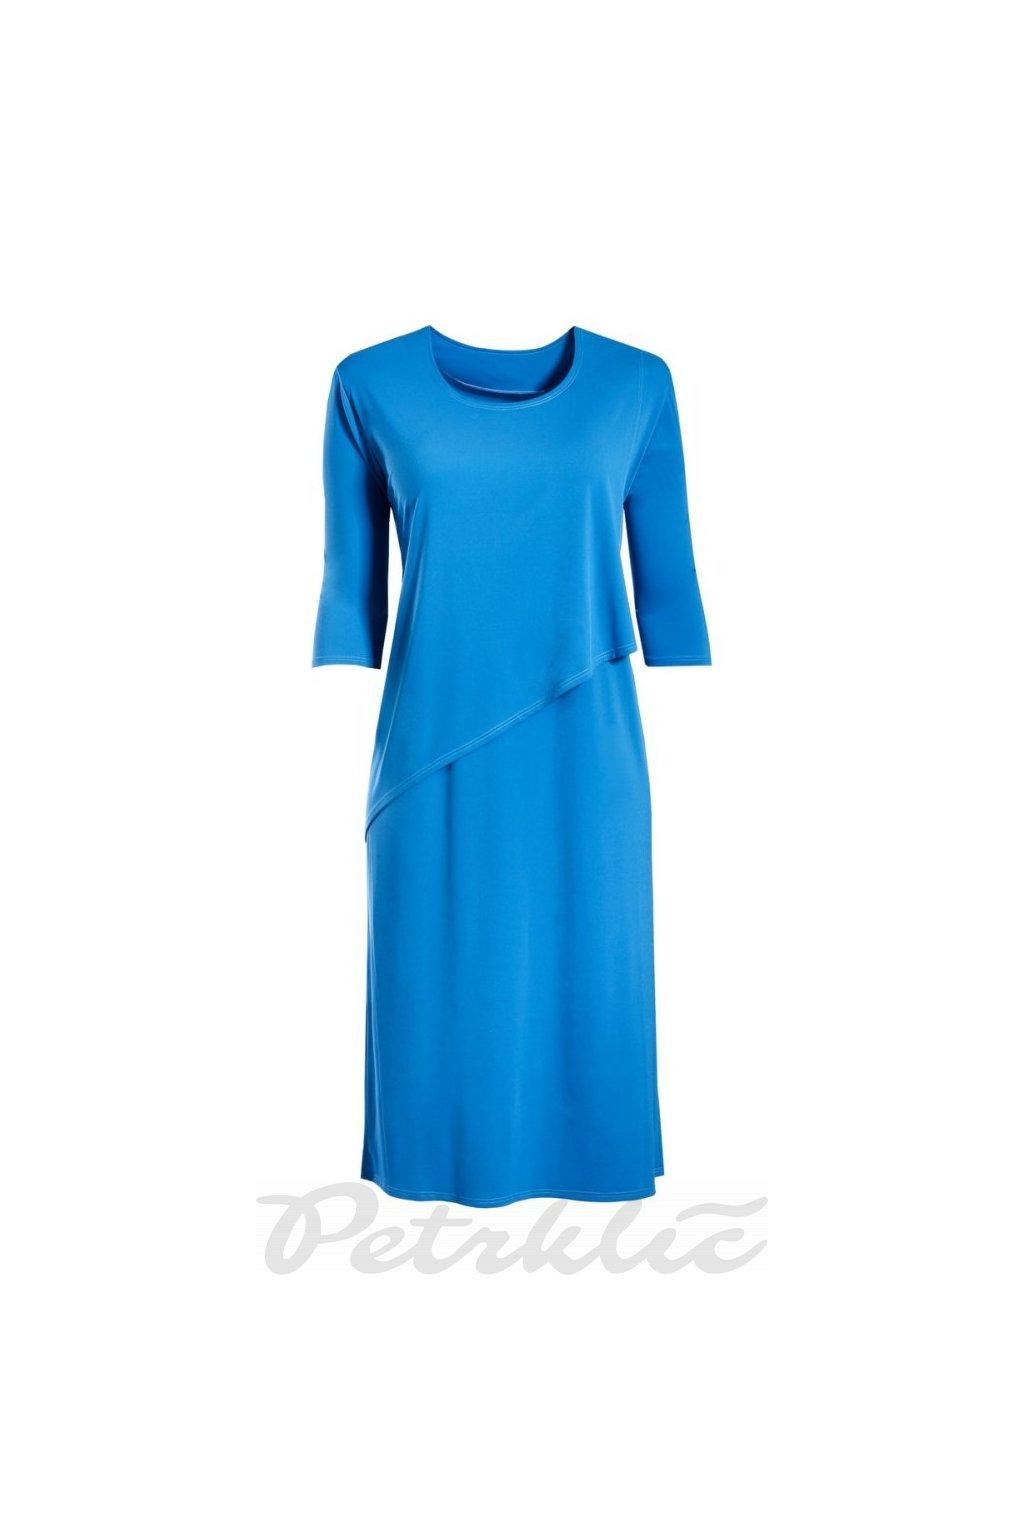 LENKA šaty krátký rukáv 130 cm